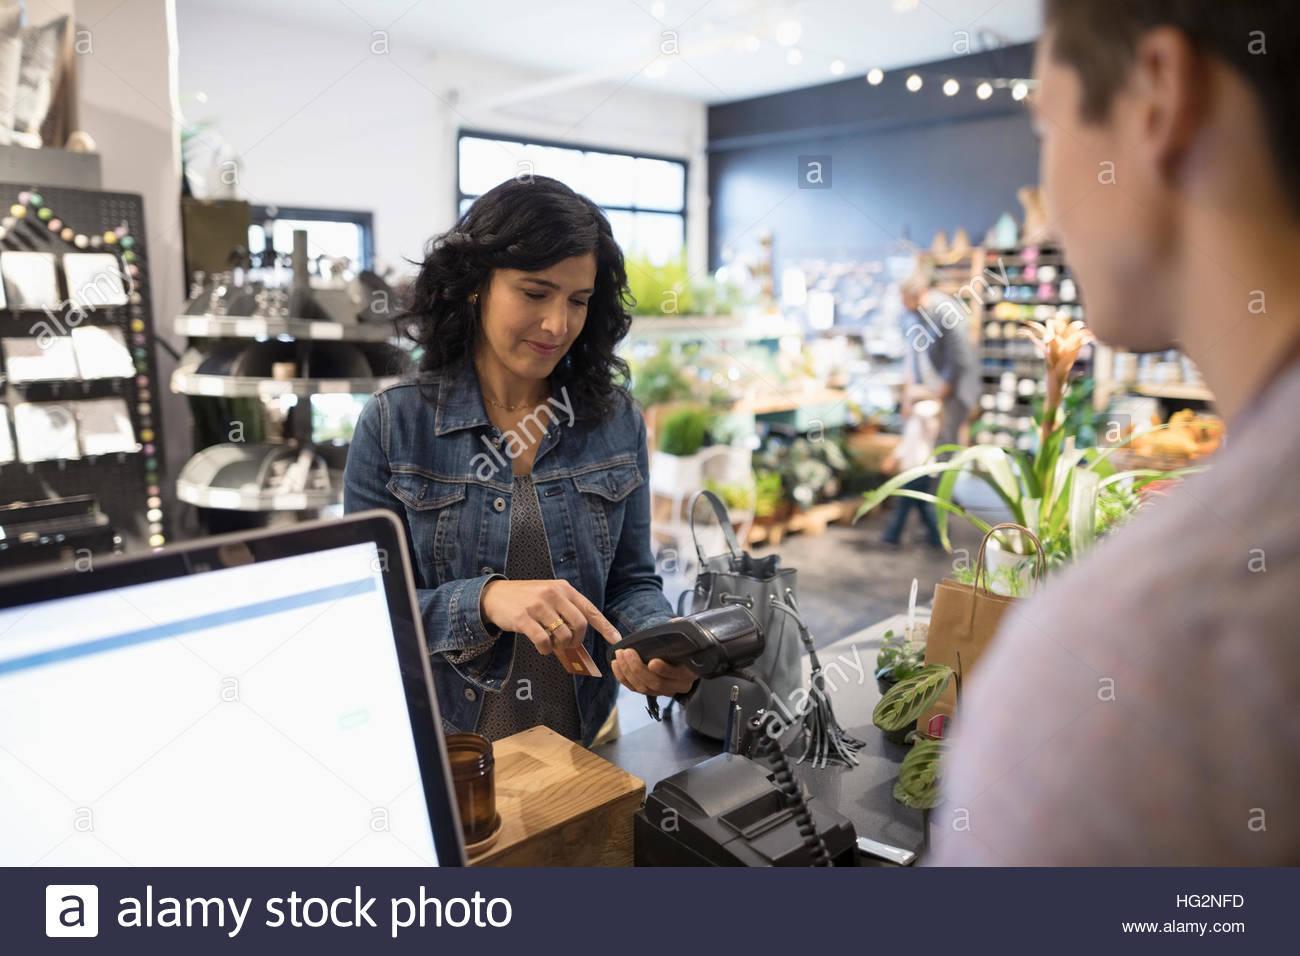 Female customer paying using pin entry credit card reader at plant shop counter - Stock Image